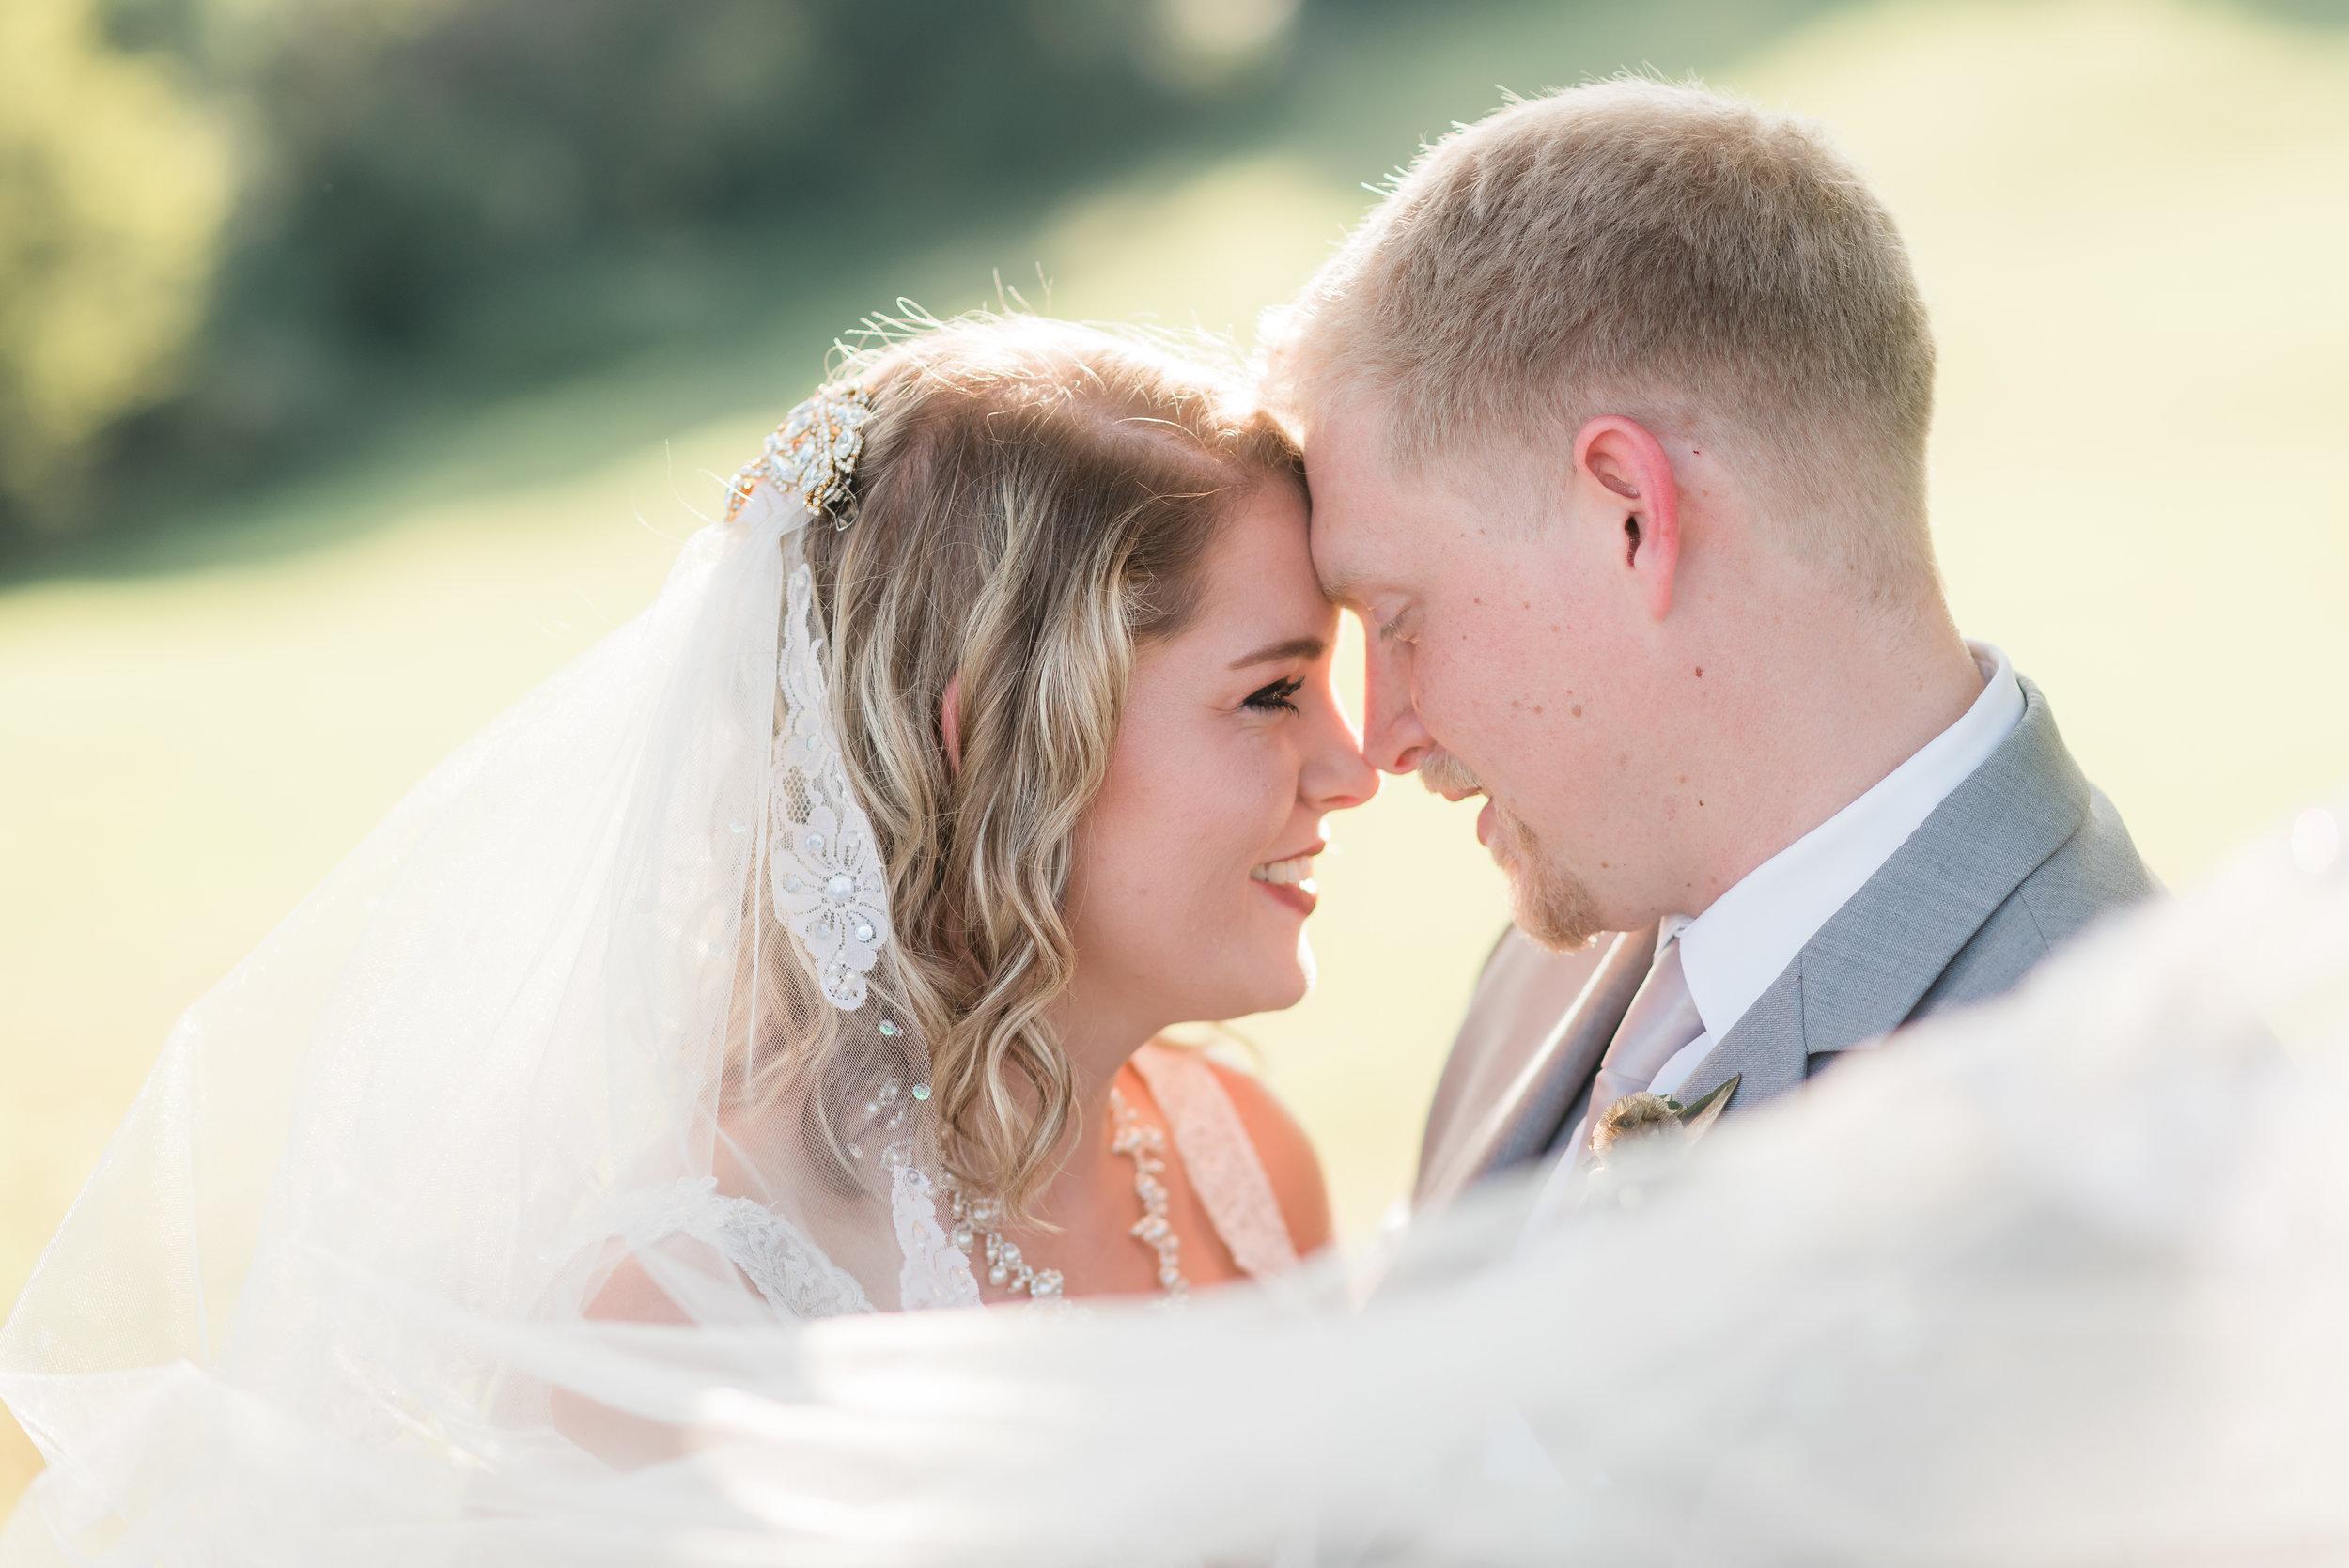 Rachel & Matthew Denton - September 29, 2018Sarah Larae Photography